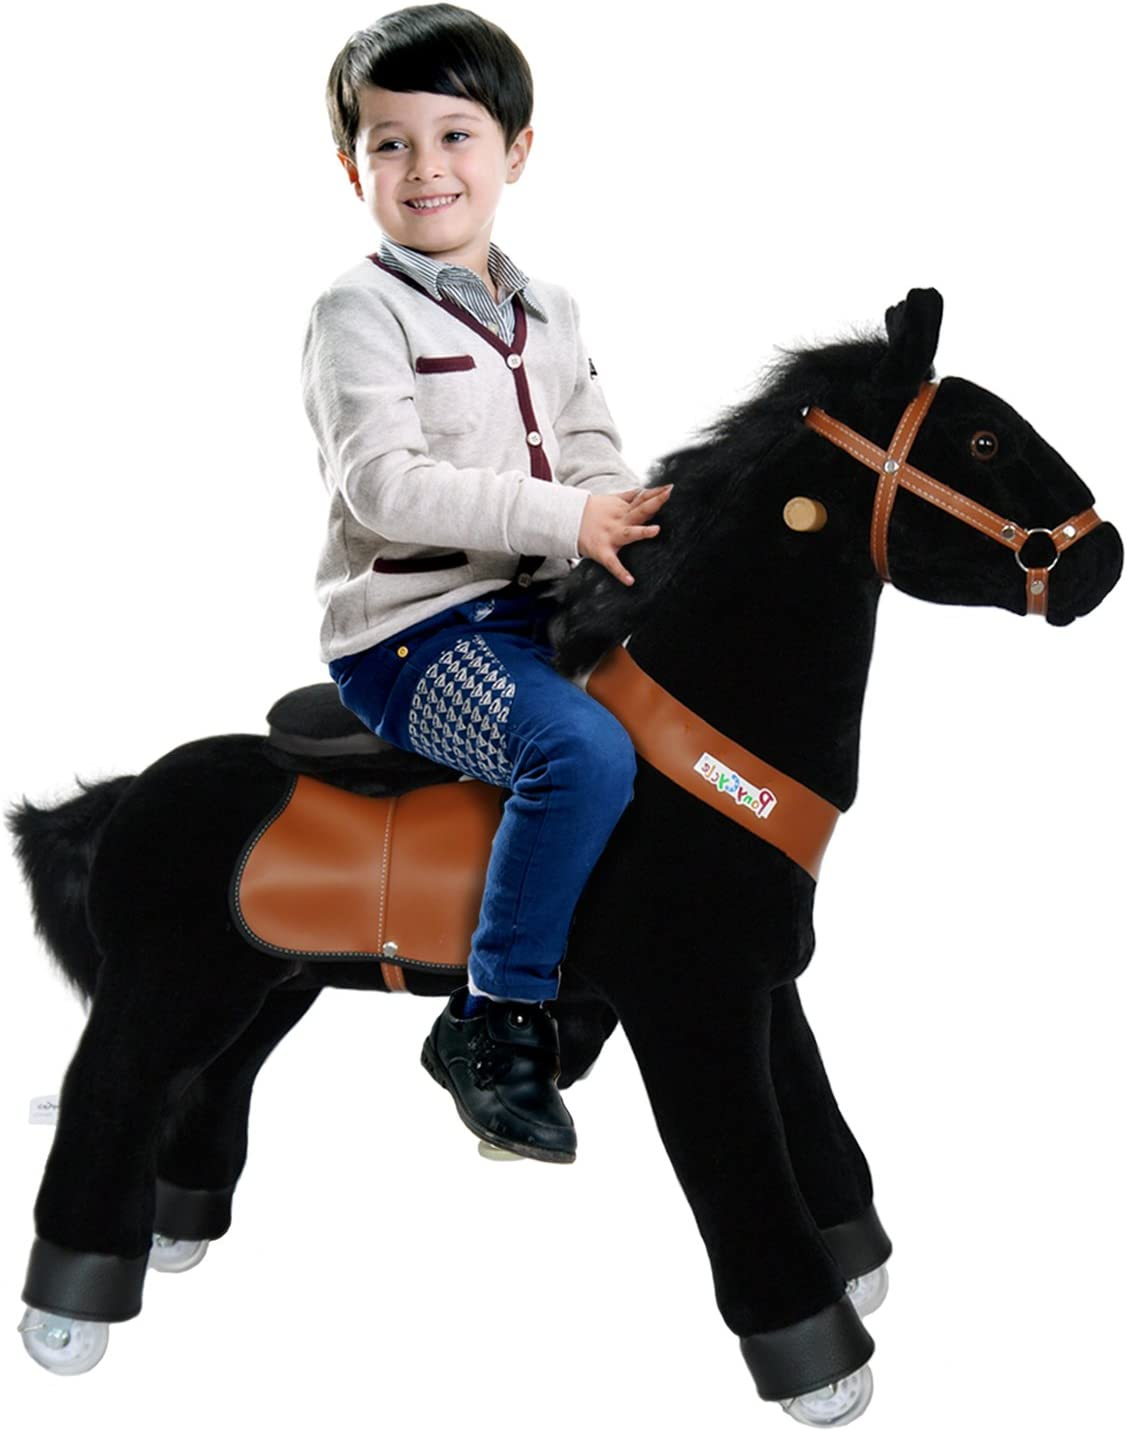 PonyCycle Toy Ride on Pony Horse Black Medium Black Mane